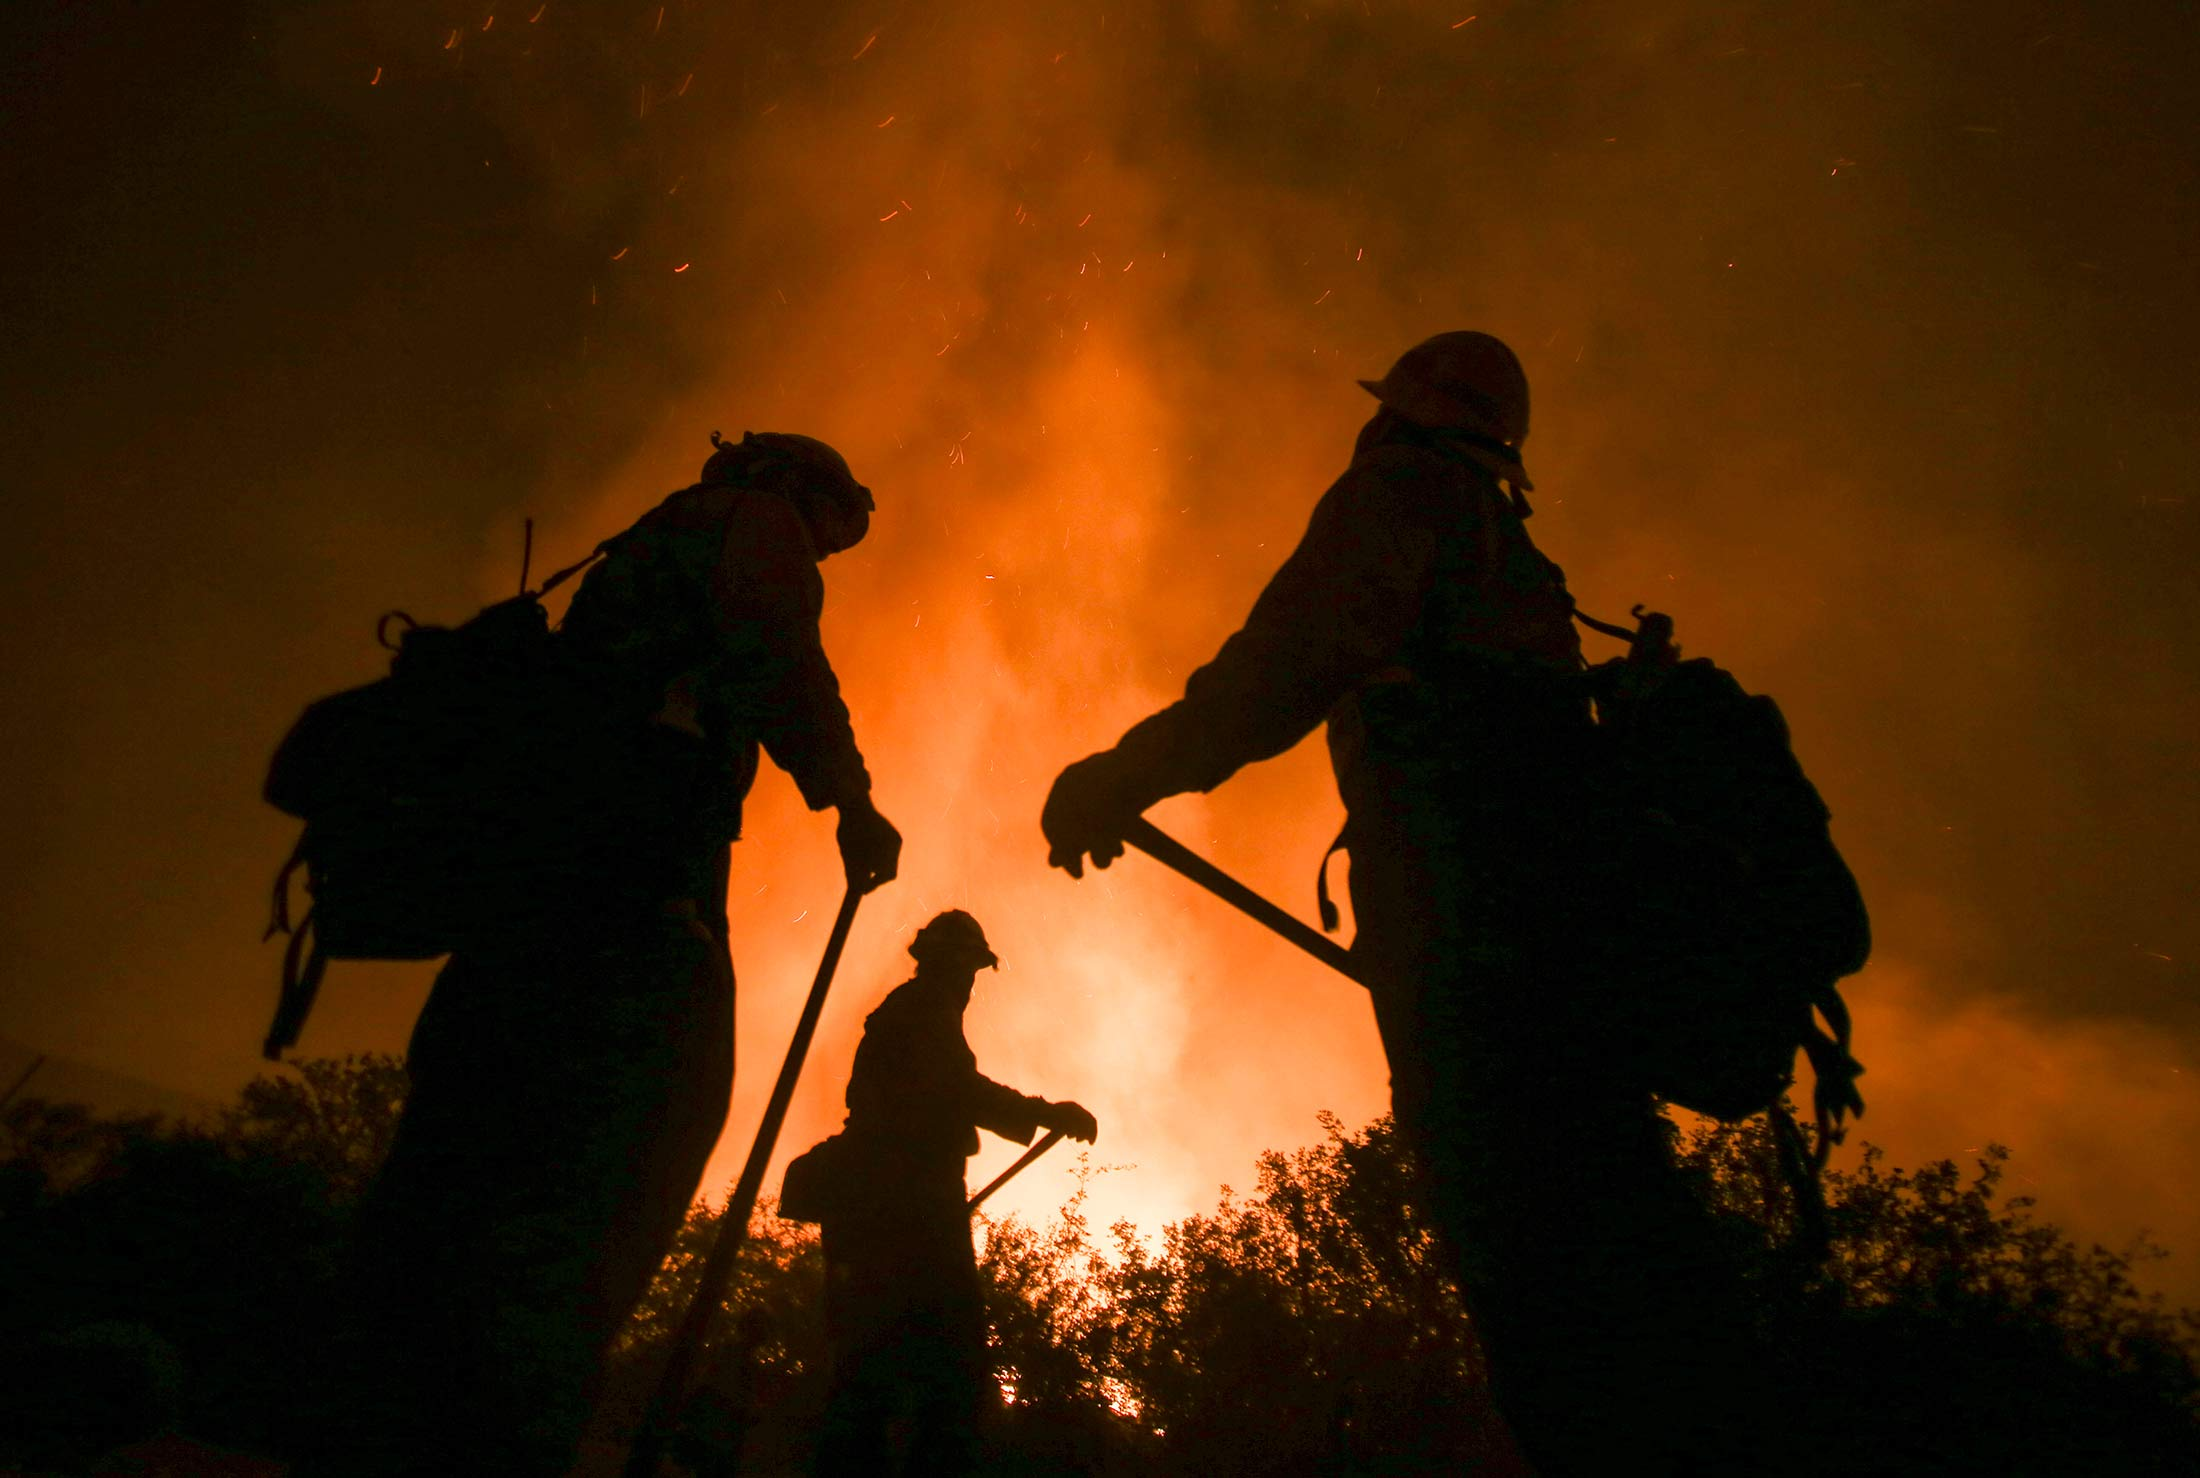 Firefighters battle the Blue Cut wildfire near Cajon Pass, north of San Bernardino, California, on Aug. 16, 2016.